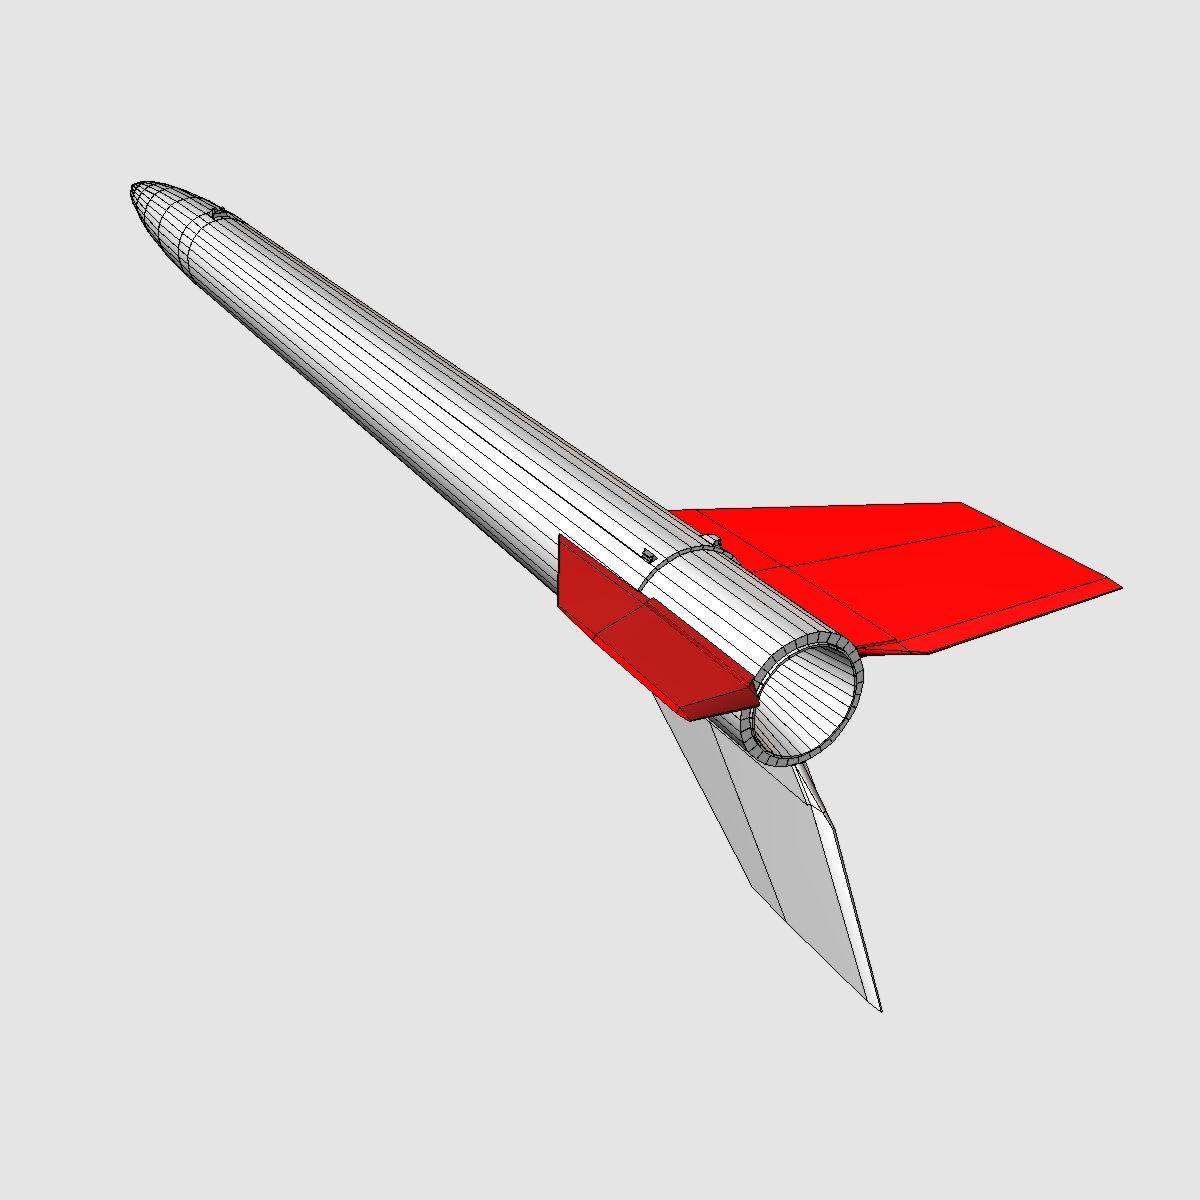 black brant vb sounding rocket 3d model 3ds dxf cob x obj 150877